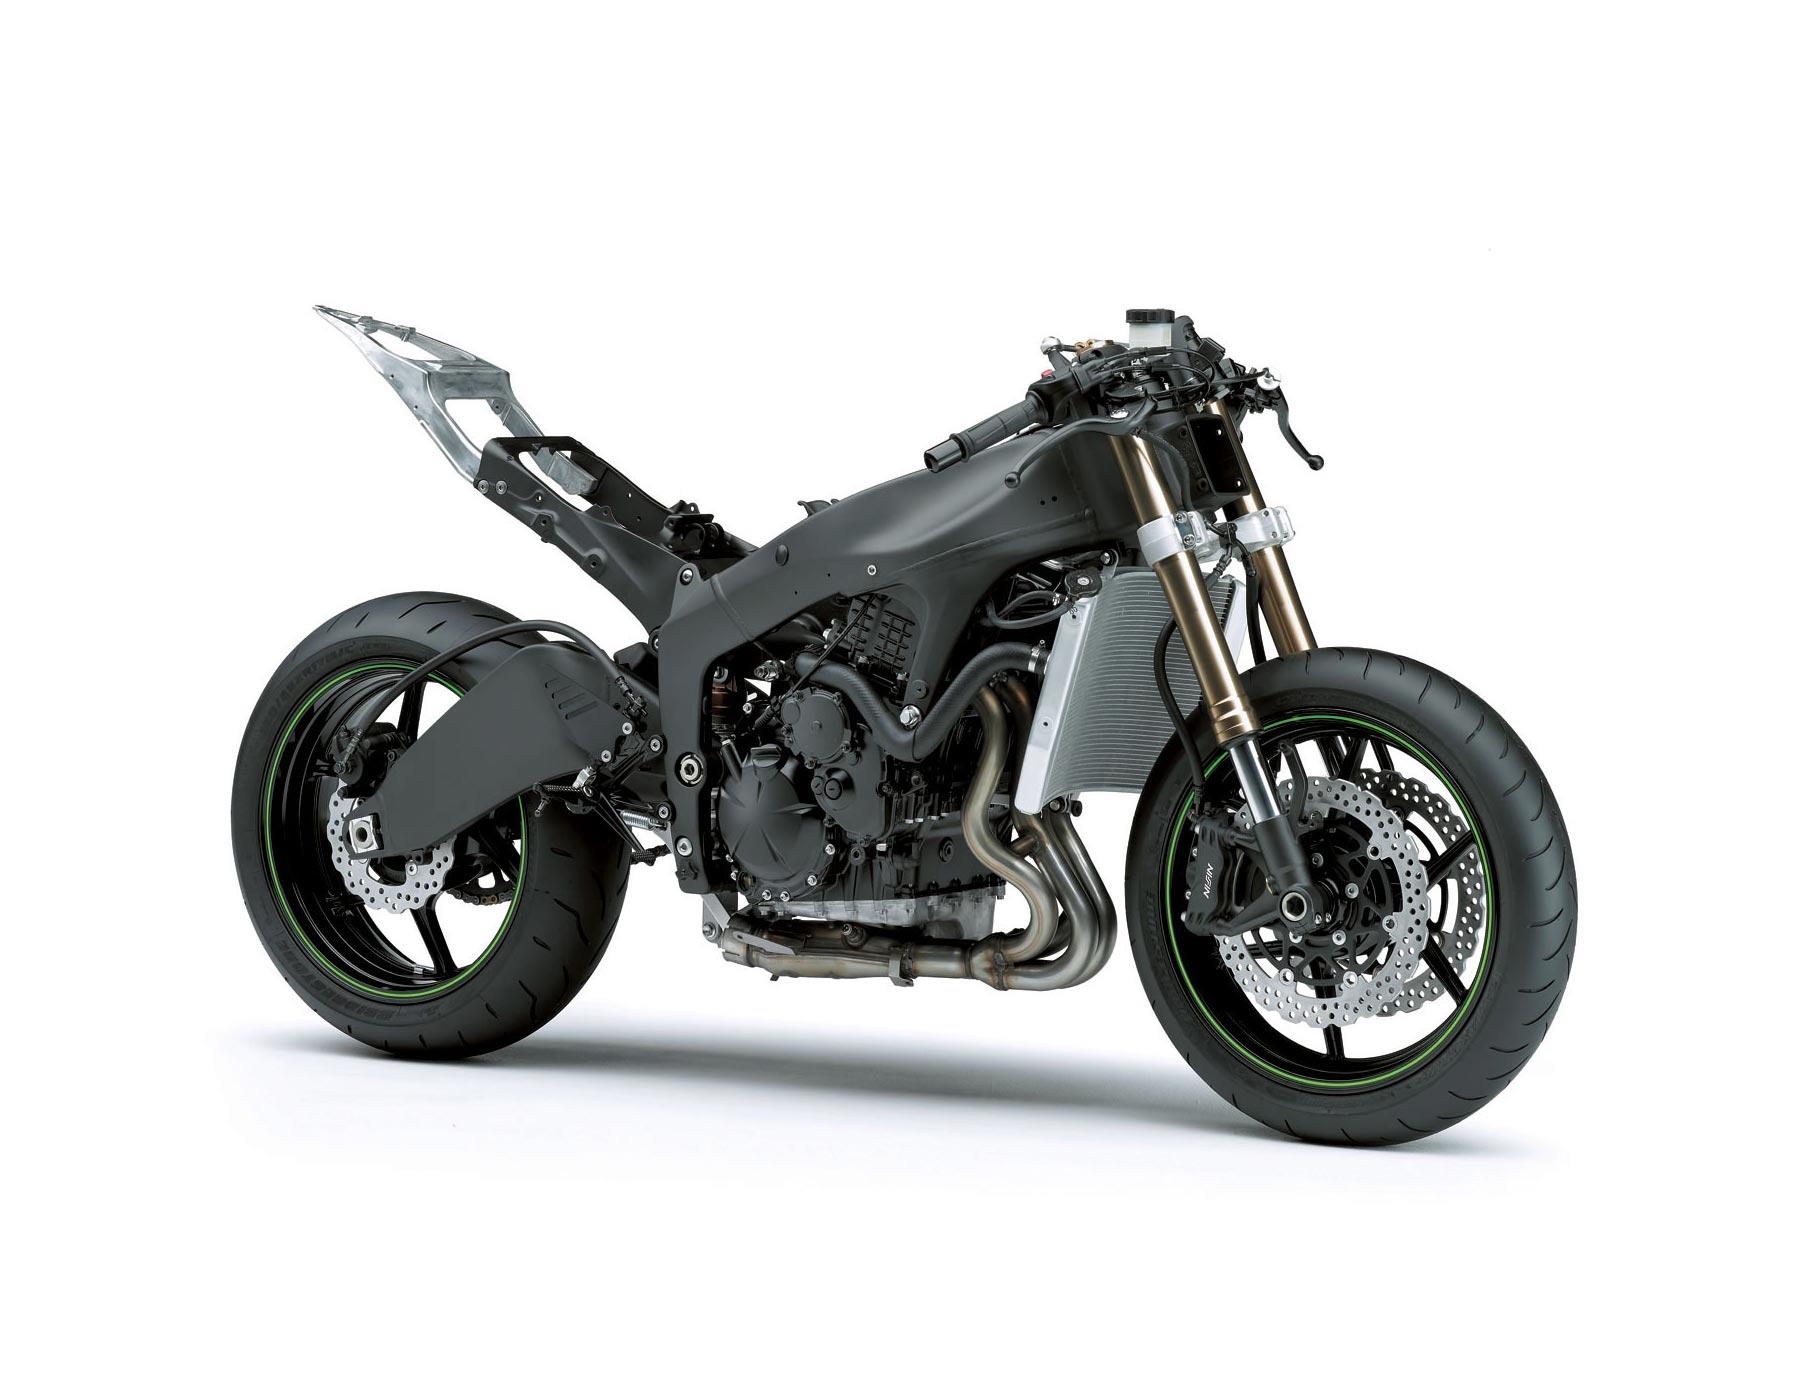 Kawasaki Ninja Zxr Mpg